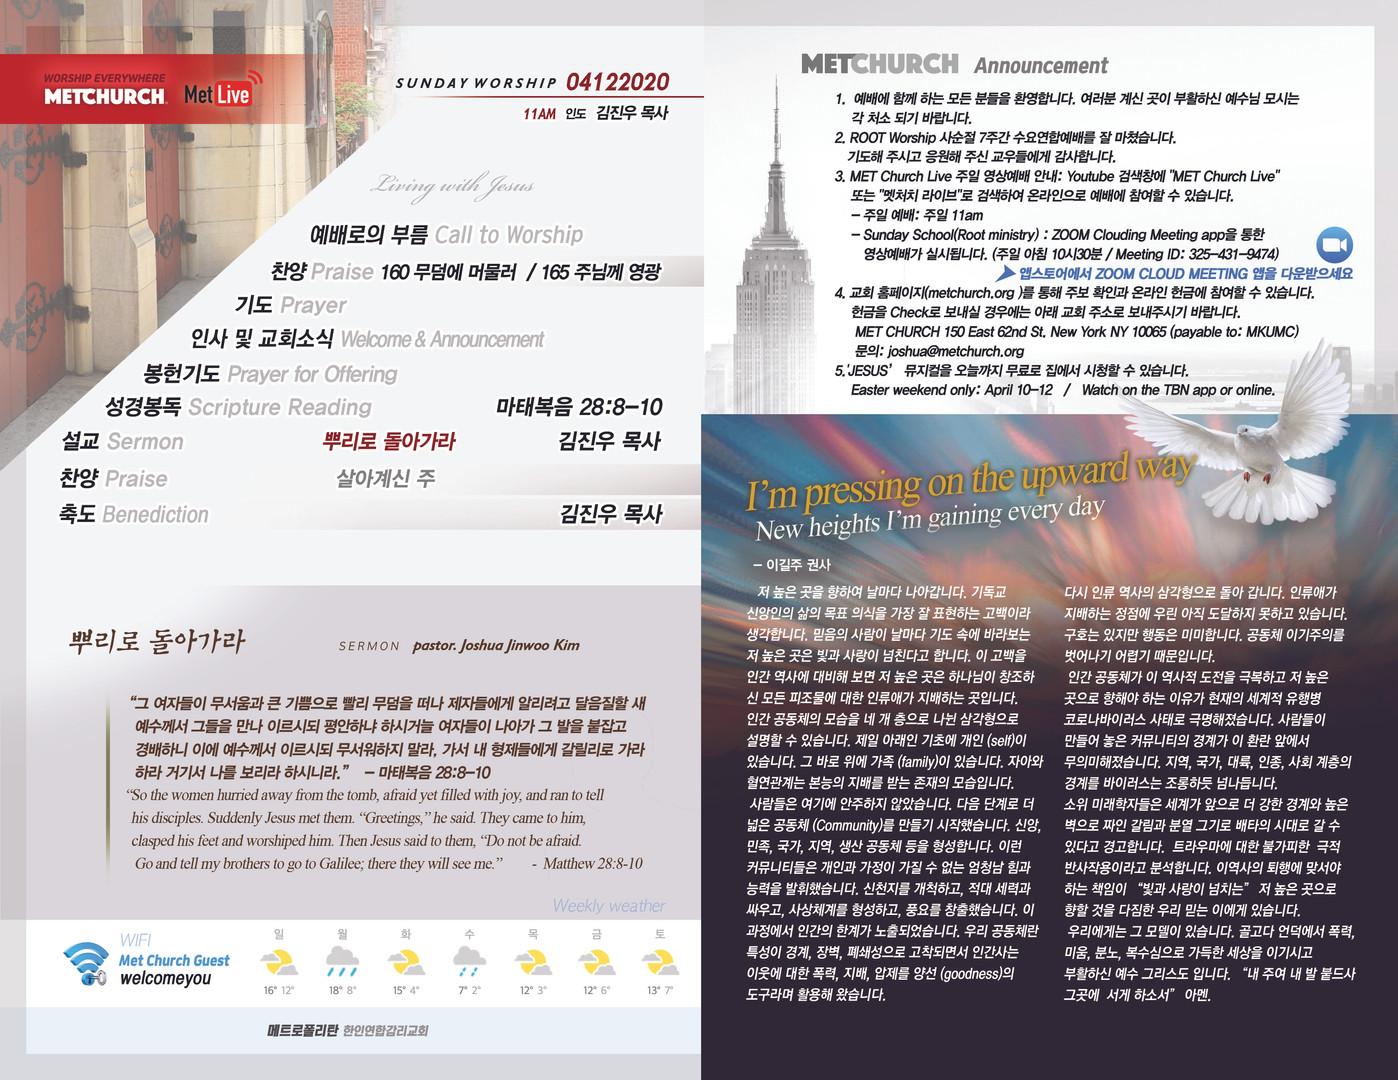 MetChurch_paper_Back_04122020 copy.jpg